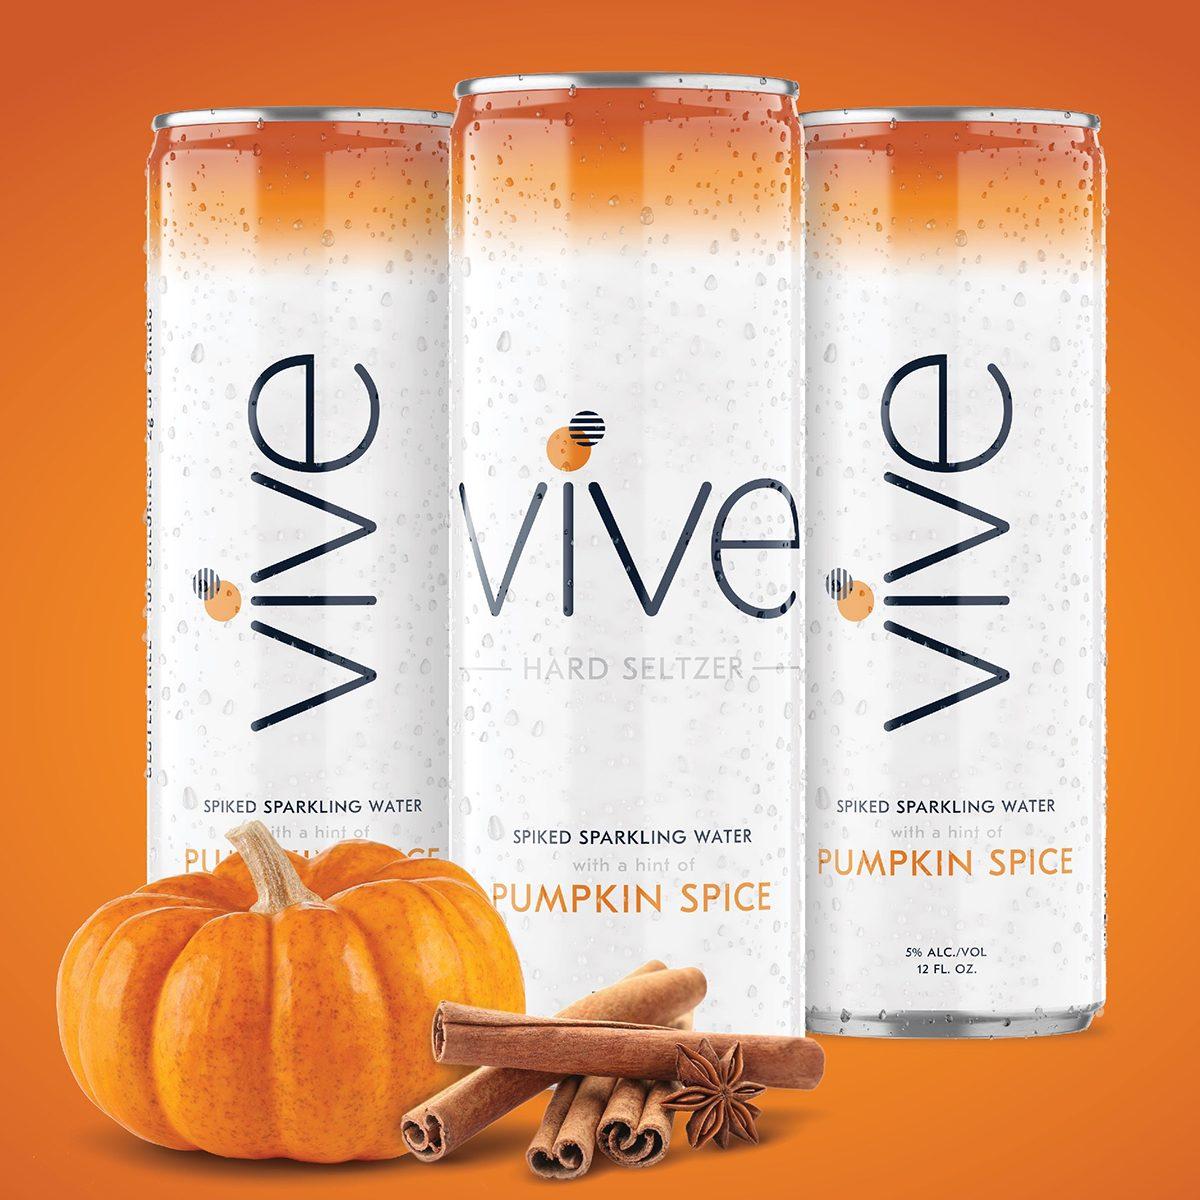 VIVE Hard Seltzer Pumpkin Spice six-packs square